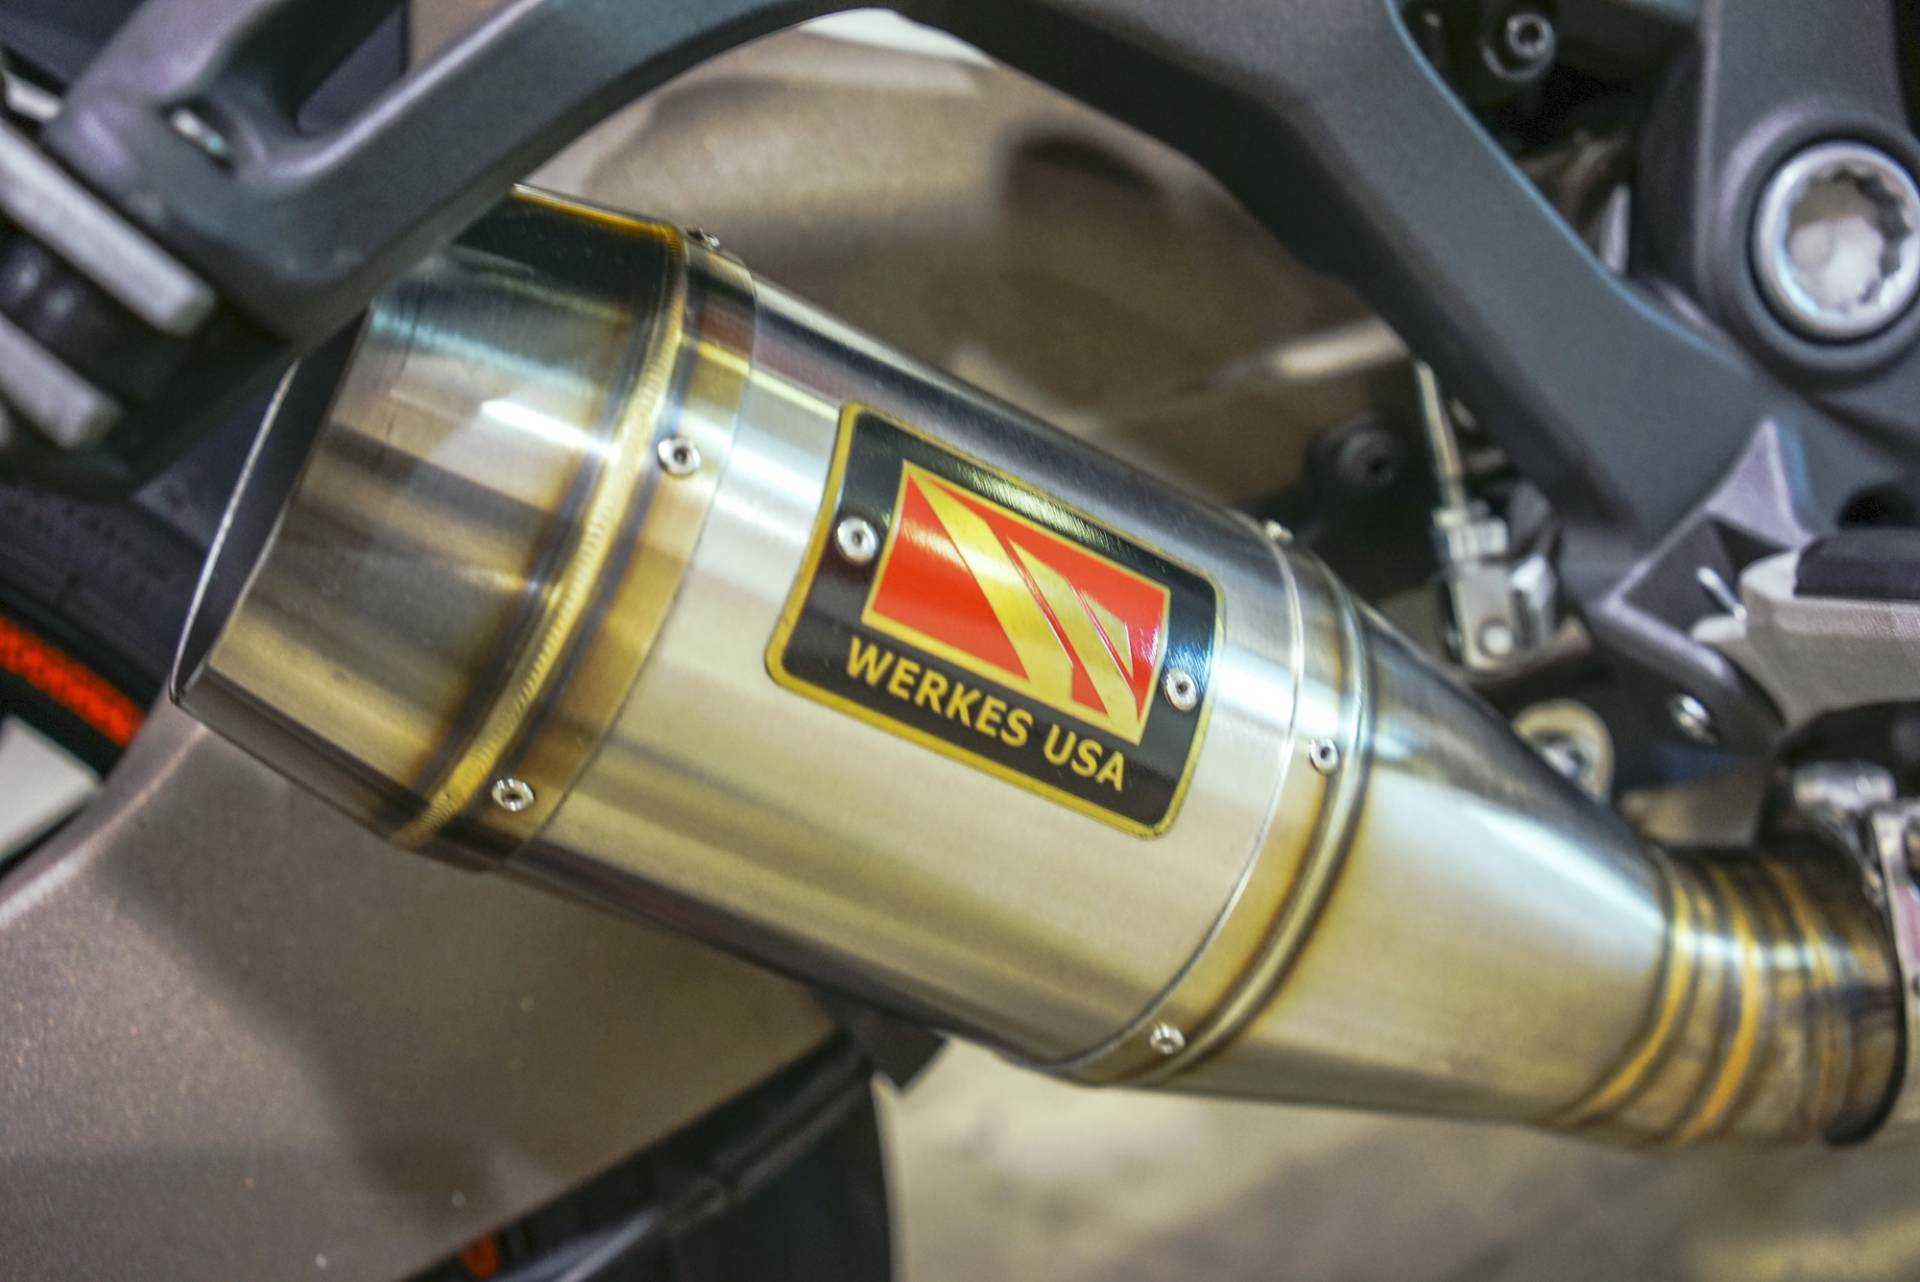 used 2015 ducati monster 821 motorcycles in brea, ca